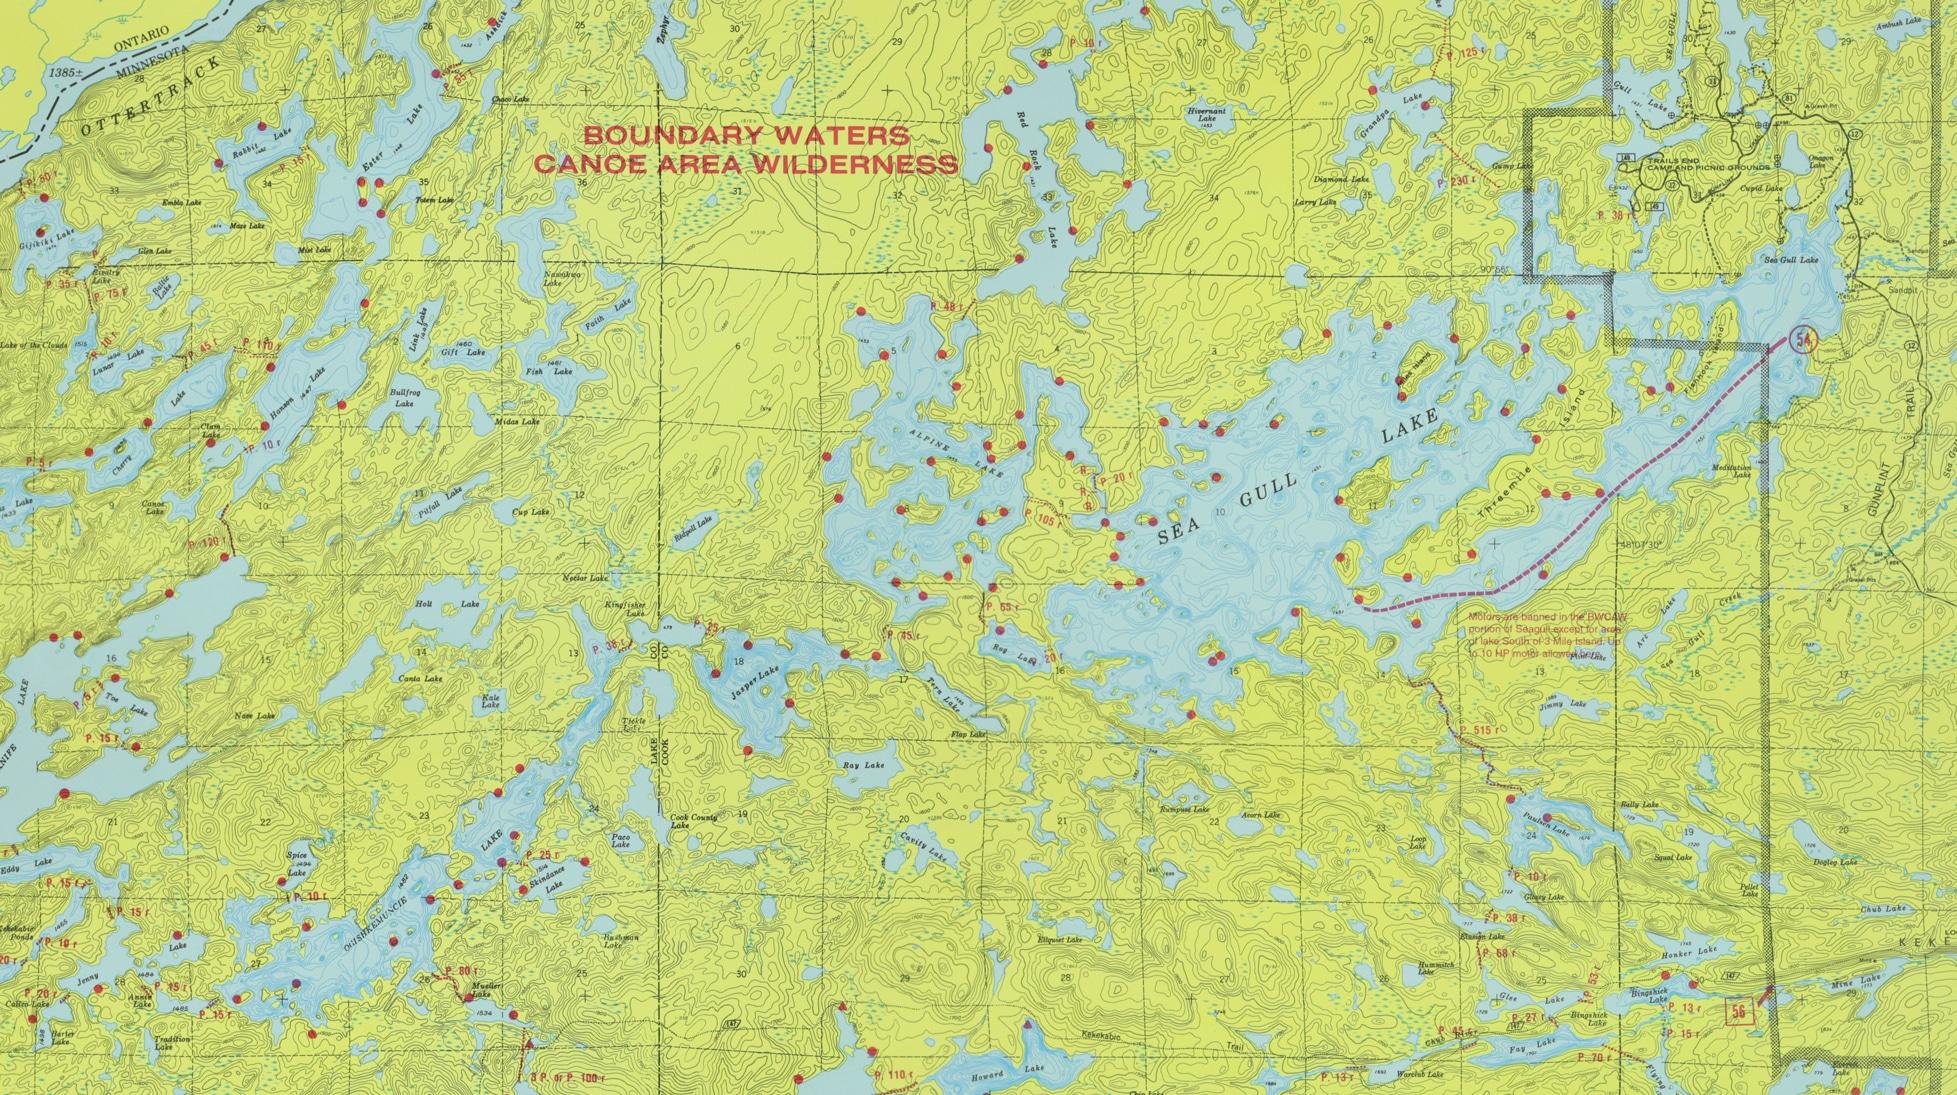 Bwca Fire Map.Ogishkemuncie Lake Base Camp Seagull Canoe Outfitters Lakeside